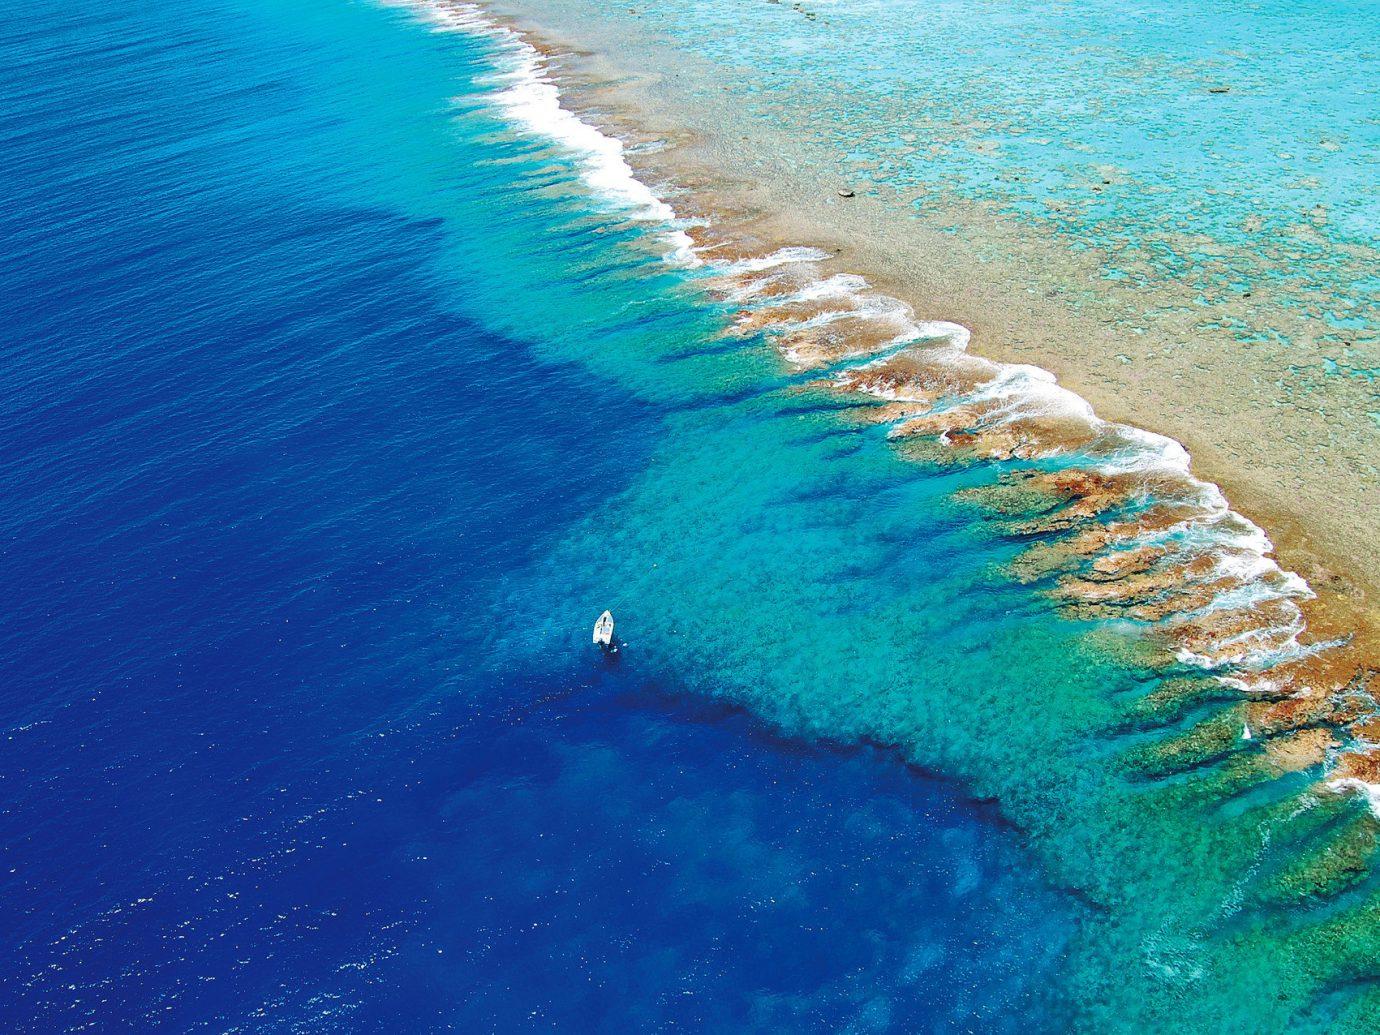 beach atThe Brando, French Polynesia